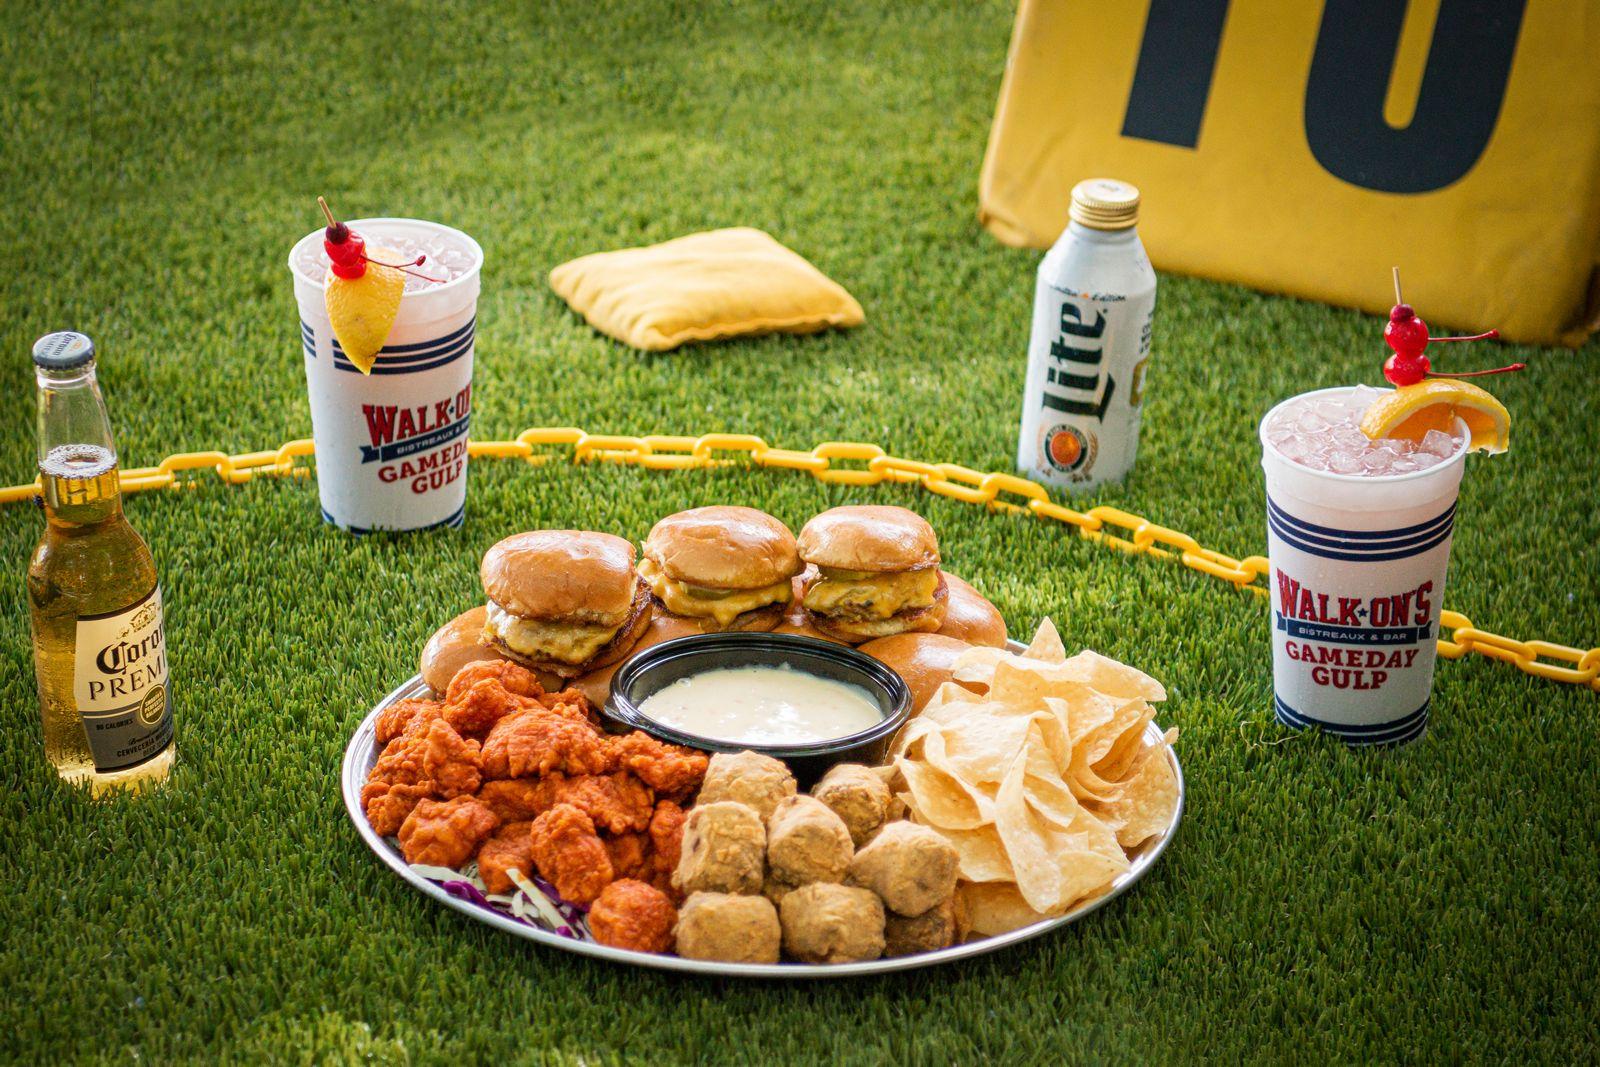 Enjoy The Taste Of Louisiana This Football Season With Walk On S Tailgate To Geaux Bundle Restaurantnews Com